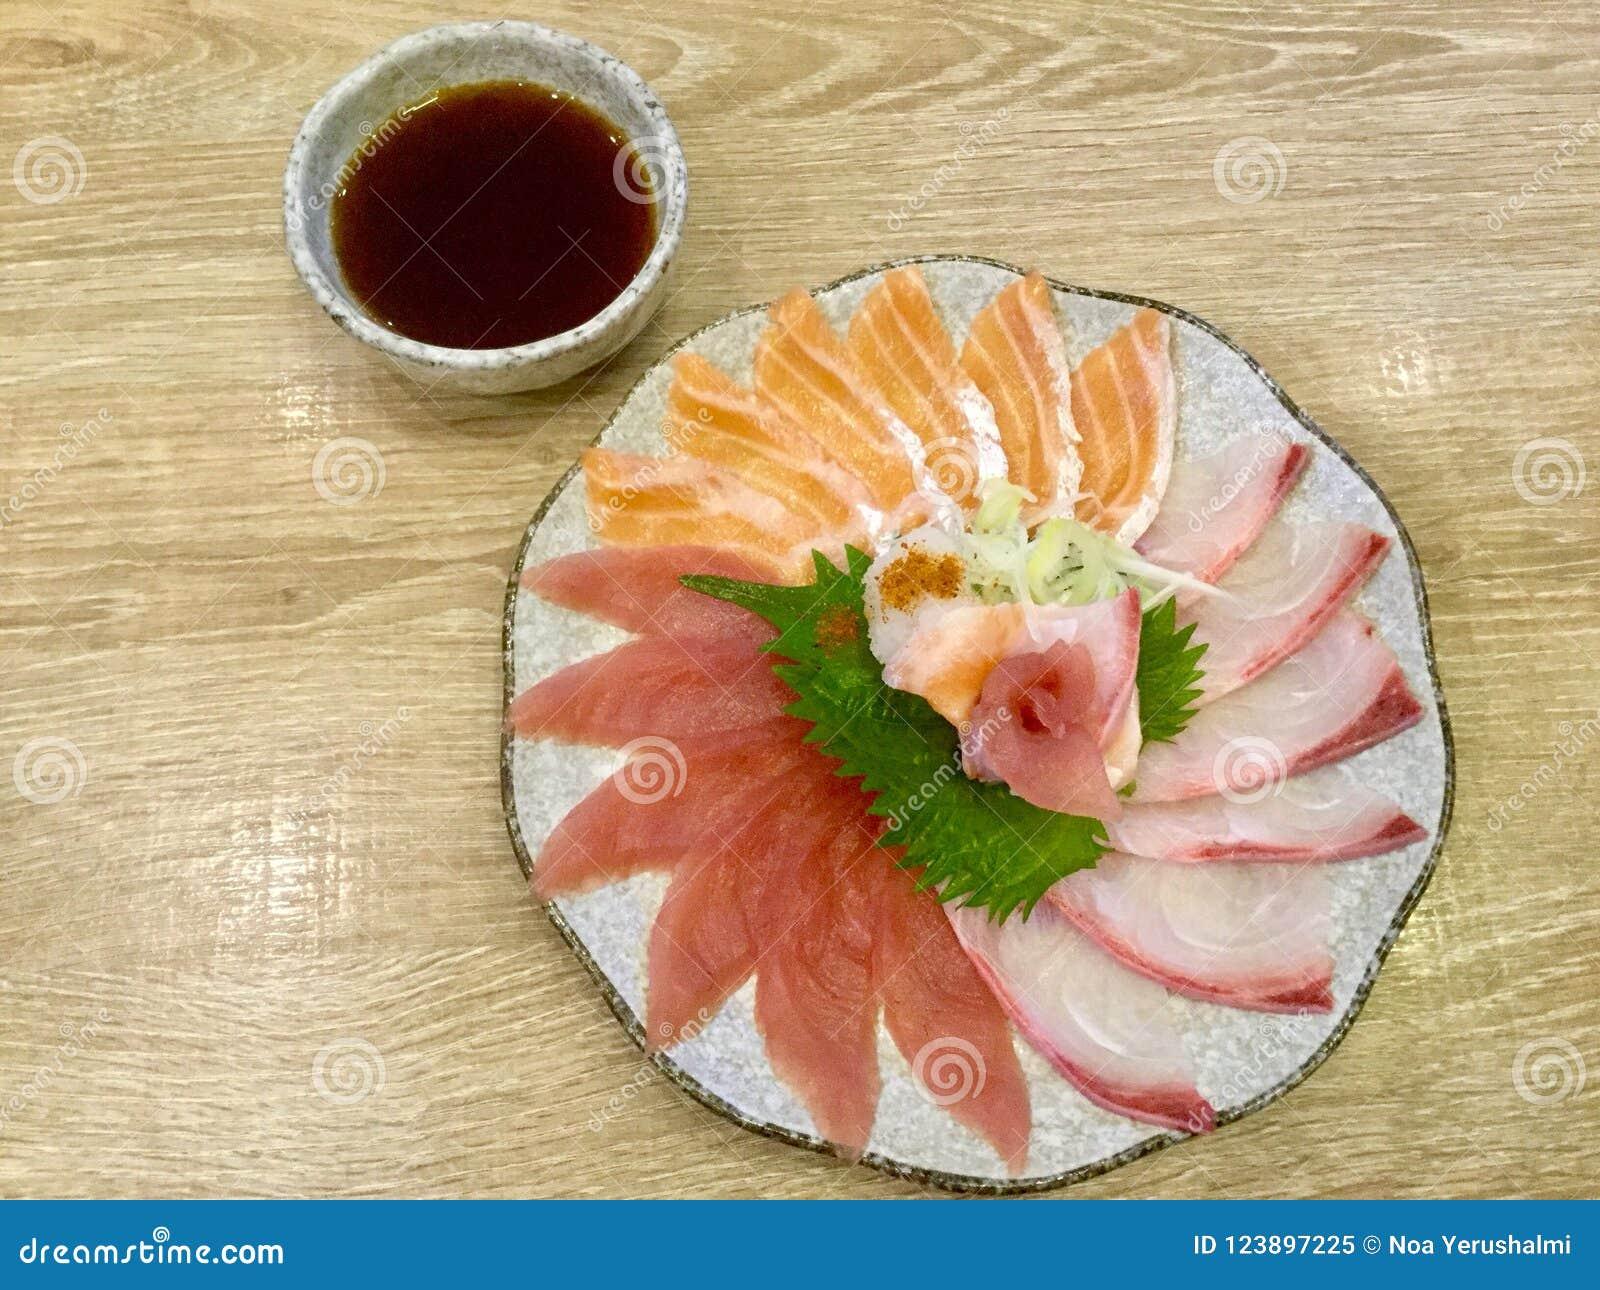 Thinly Sliced Sashimi  Tuna  Salmon  Yellowtail  Japanese Delicacy